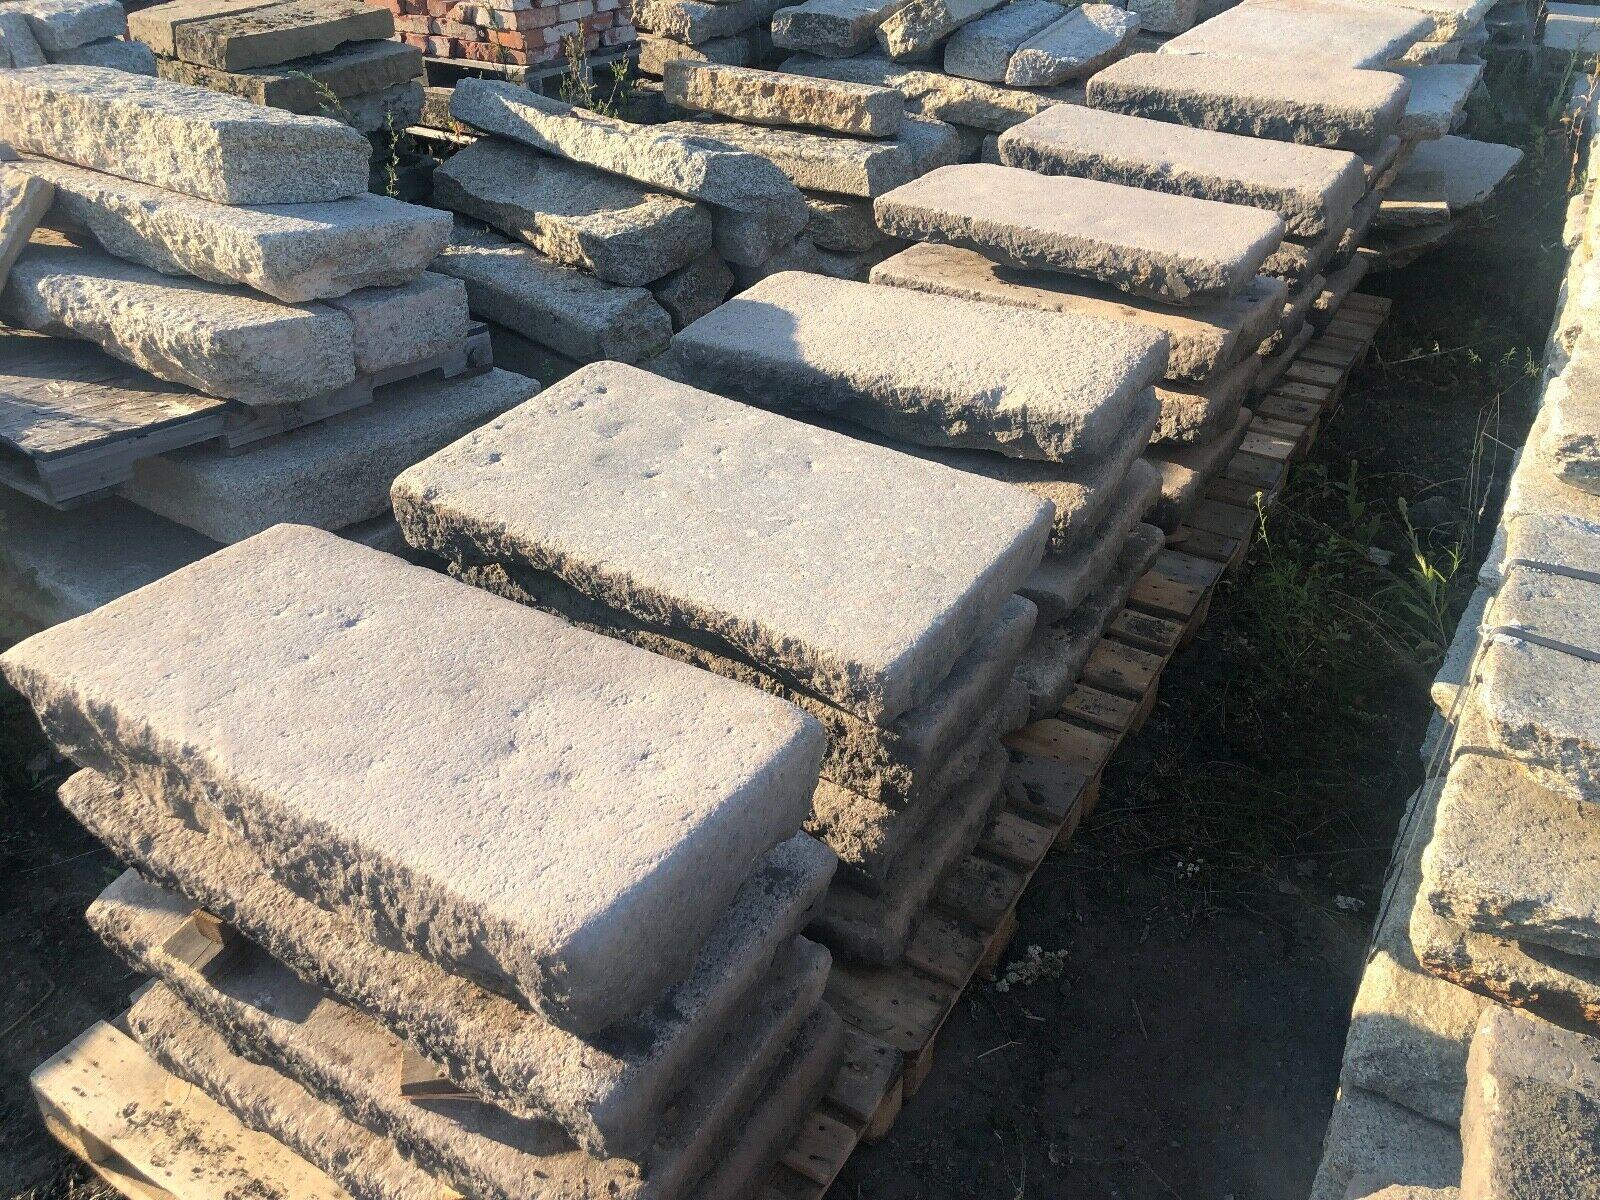 Alte Gredplatten Granitplatten Bodenplatten Naturstein Antiker Granit Ebay In 2020 Natursteine Bodenplatten Granit